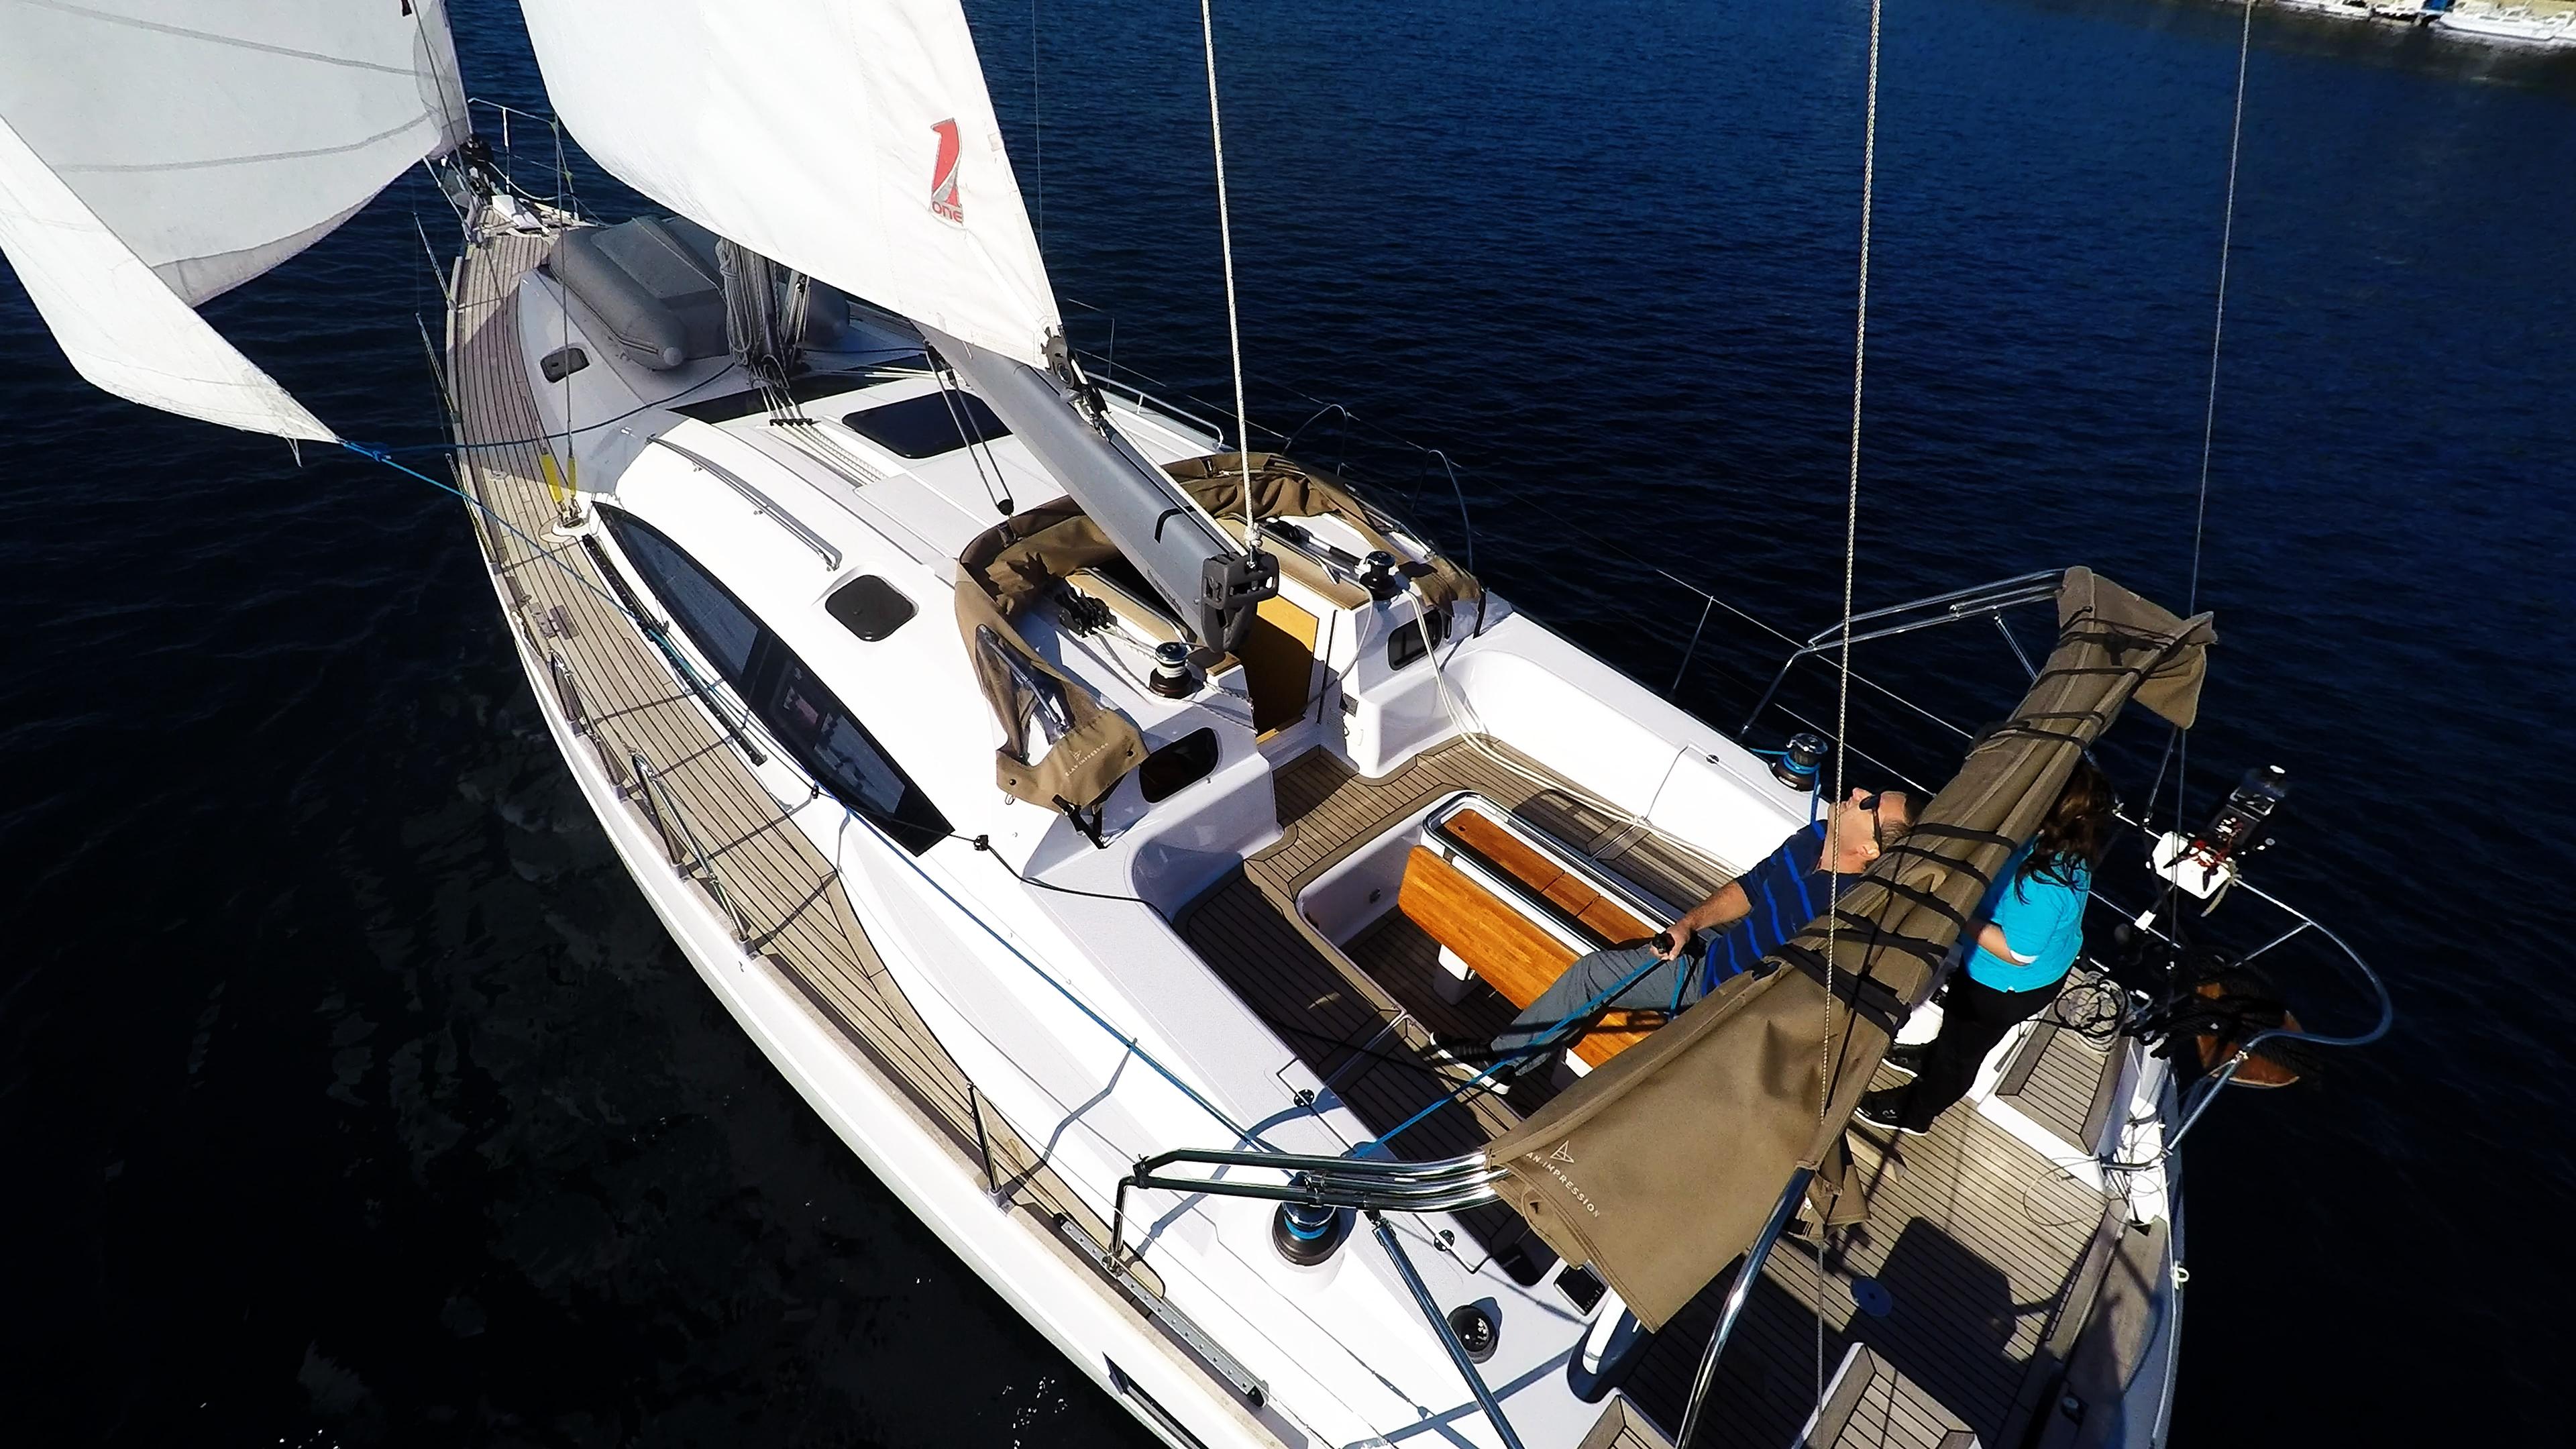 barcha a vela barca a vela pozzetto yacht a vela elan 45 vele